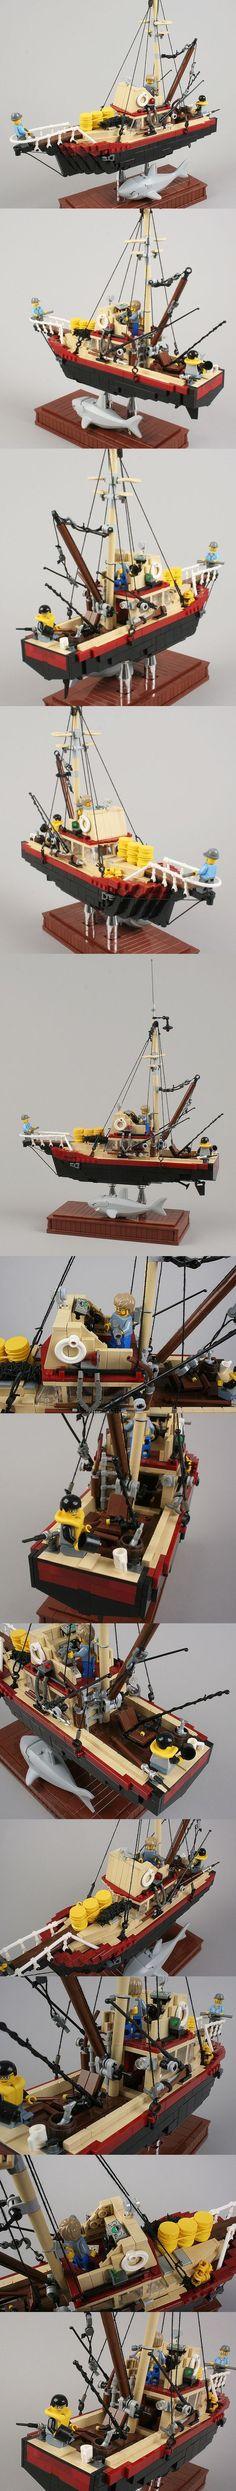 Jaws lego I want this. Lego City, Lego Boat, Lego Ship, All Lego, Lego Worlds, Cool Lego Creations, Lego Design, Lego Building, Boat Building